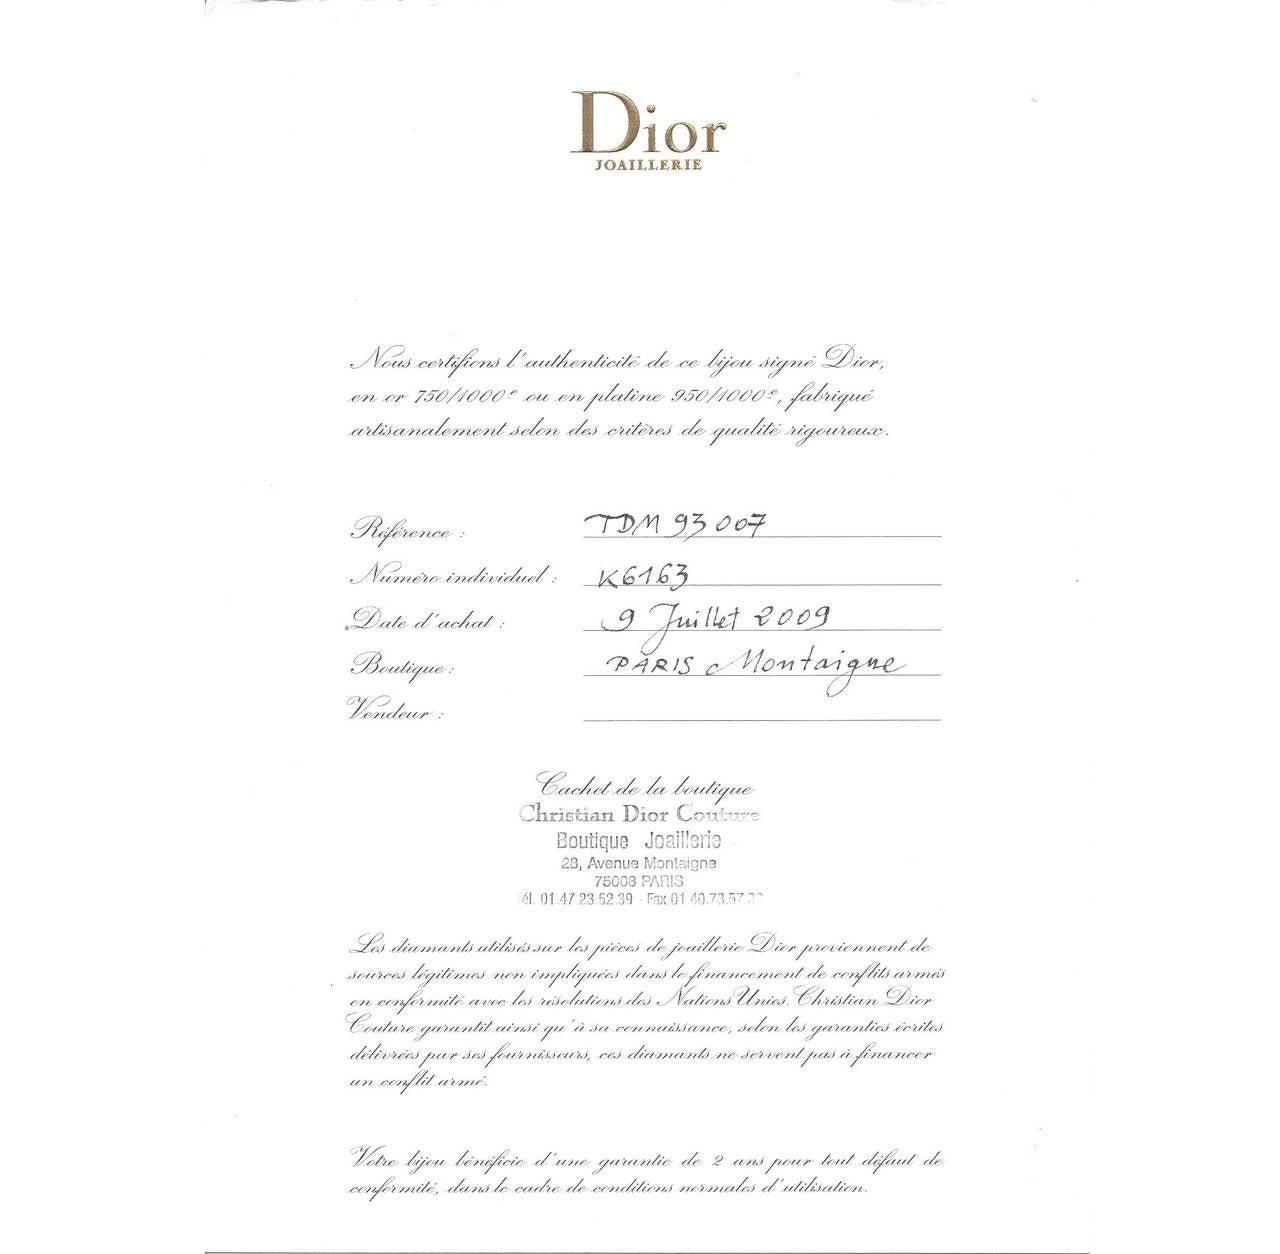 Dior Joaillerie Victoire de Castellane Kings and Queens Roi de Sugilite Pendant 6